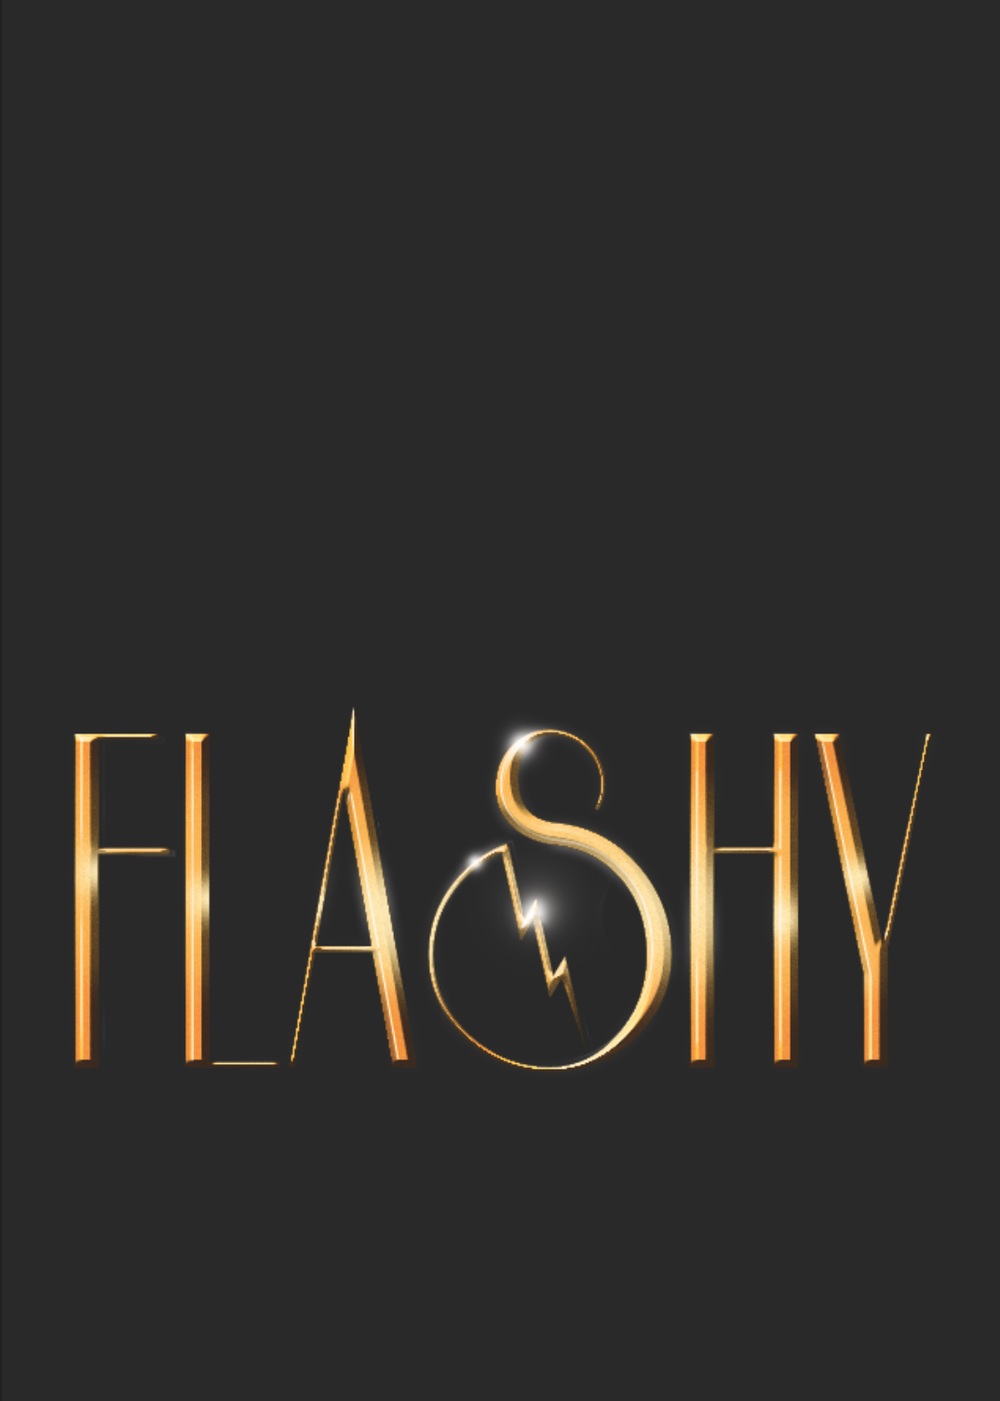 flashyjeans.png